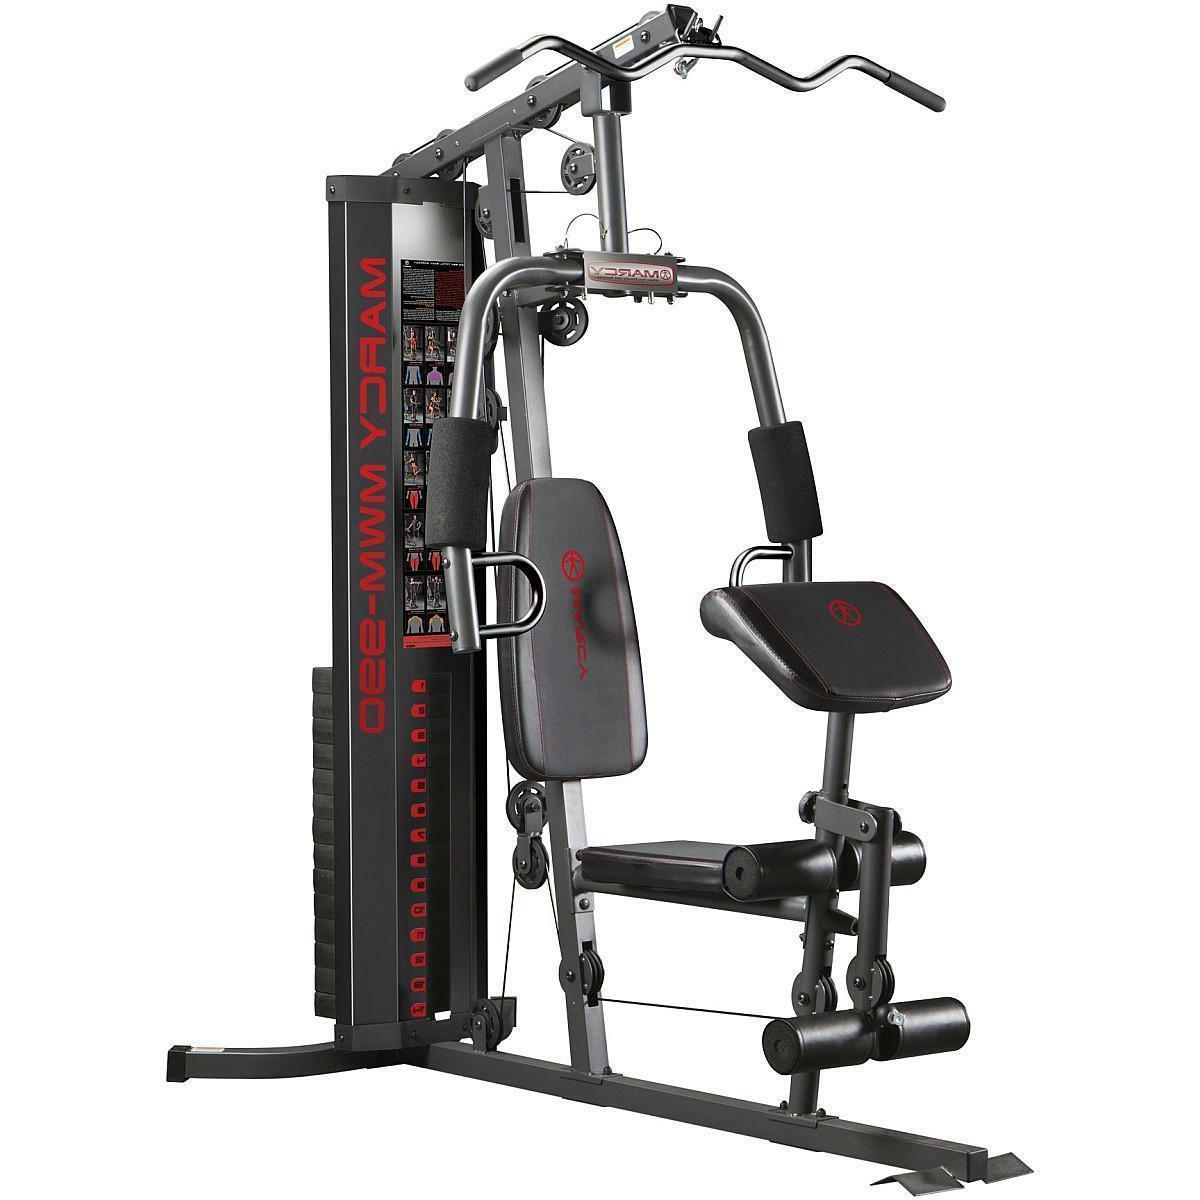 new 150lb stack home gym mwm 990